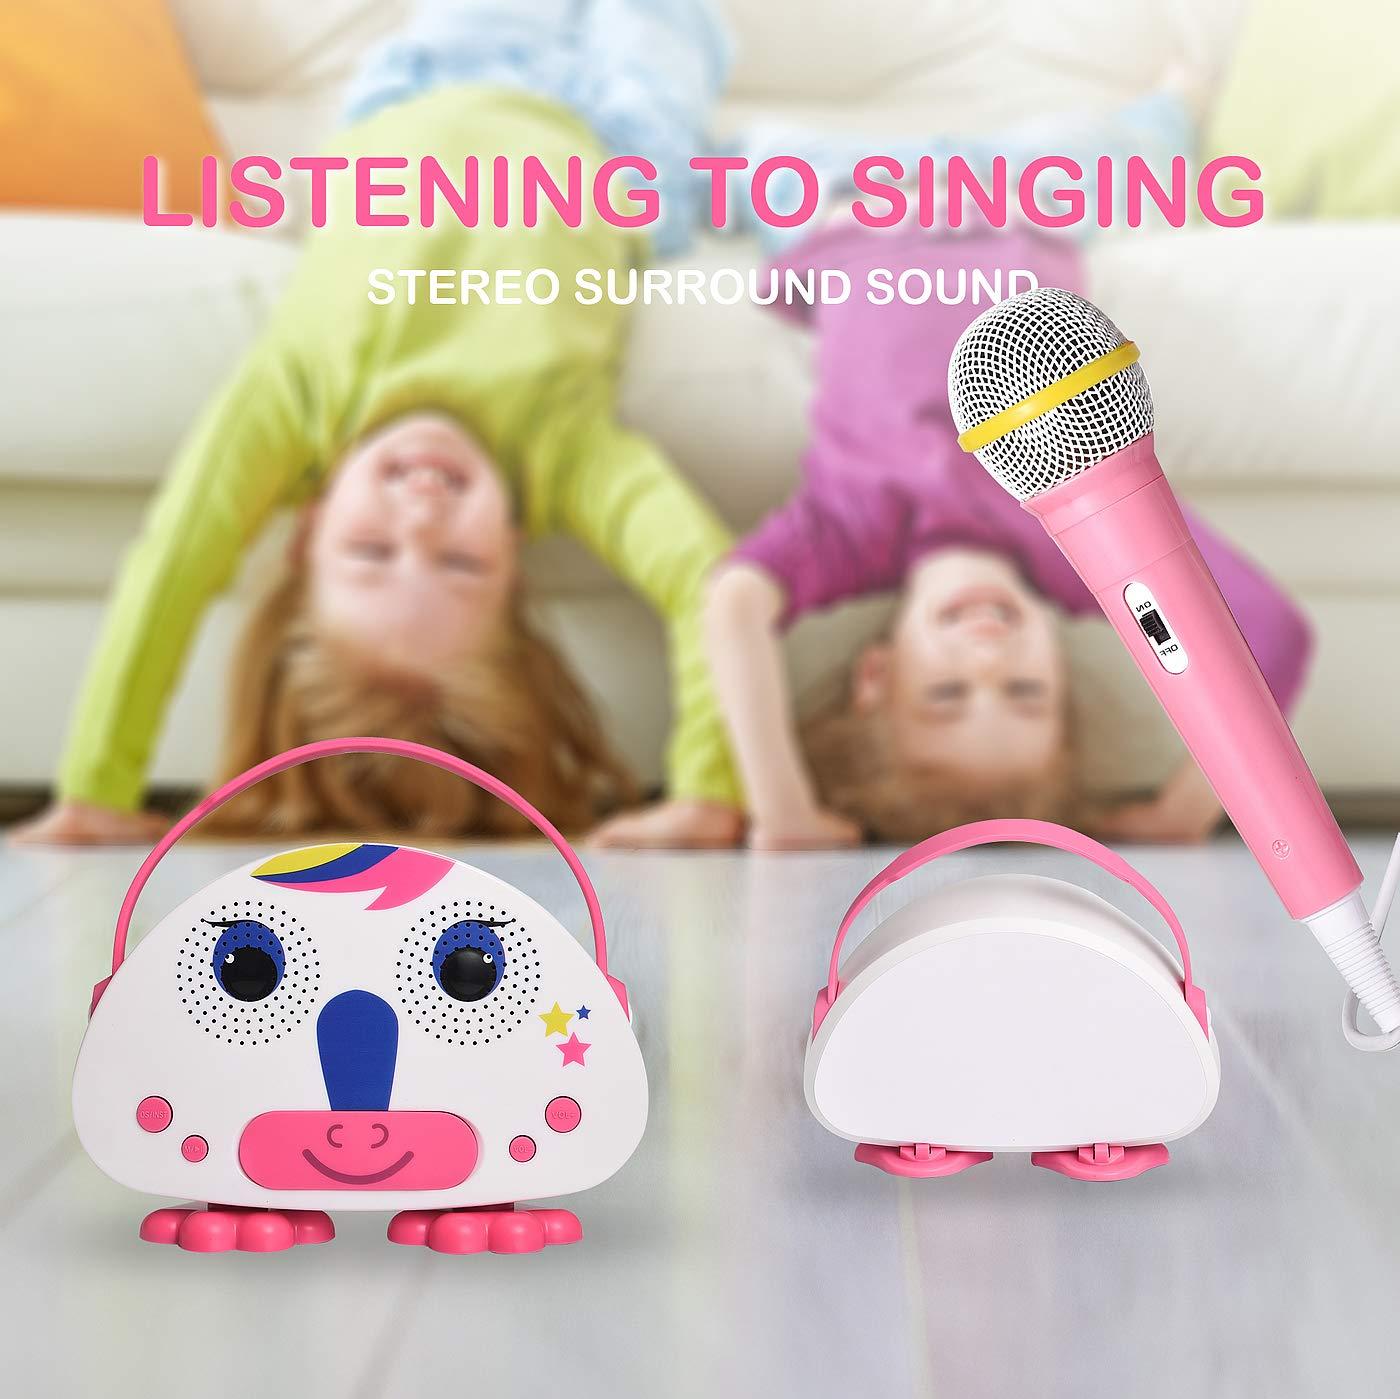 HowQ Outdoor Toys Karaoke Machine , Portable Kids Karaoke Bluetooth Speaker Wireless Cartoon Speaker for Kids for Indoor Toys Travel Activities with Microphone Karaoke Machine(Pink-White) by HowQ (Image #9)